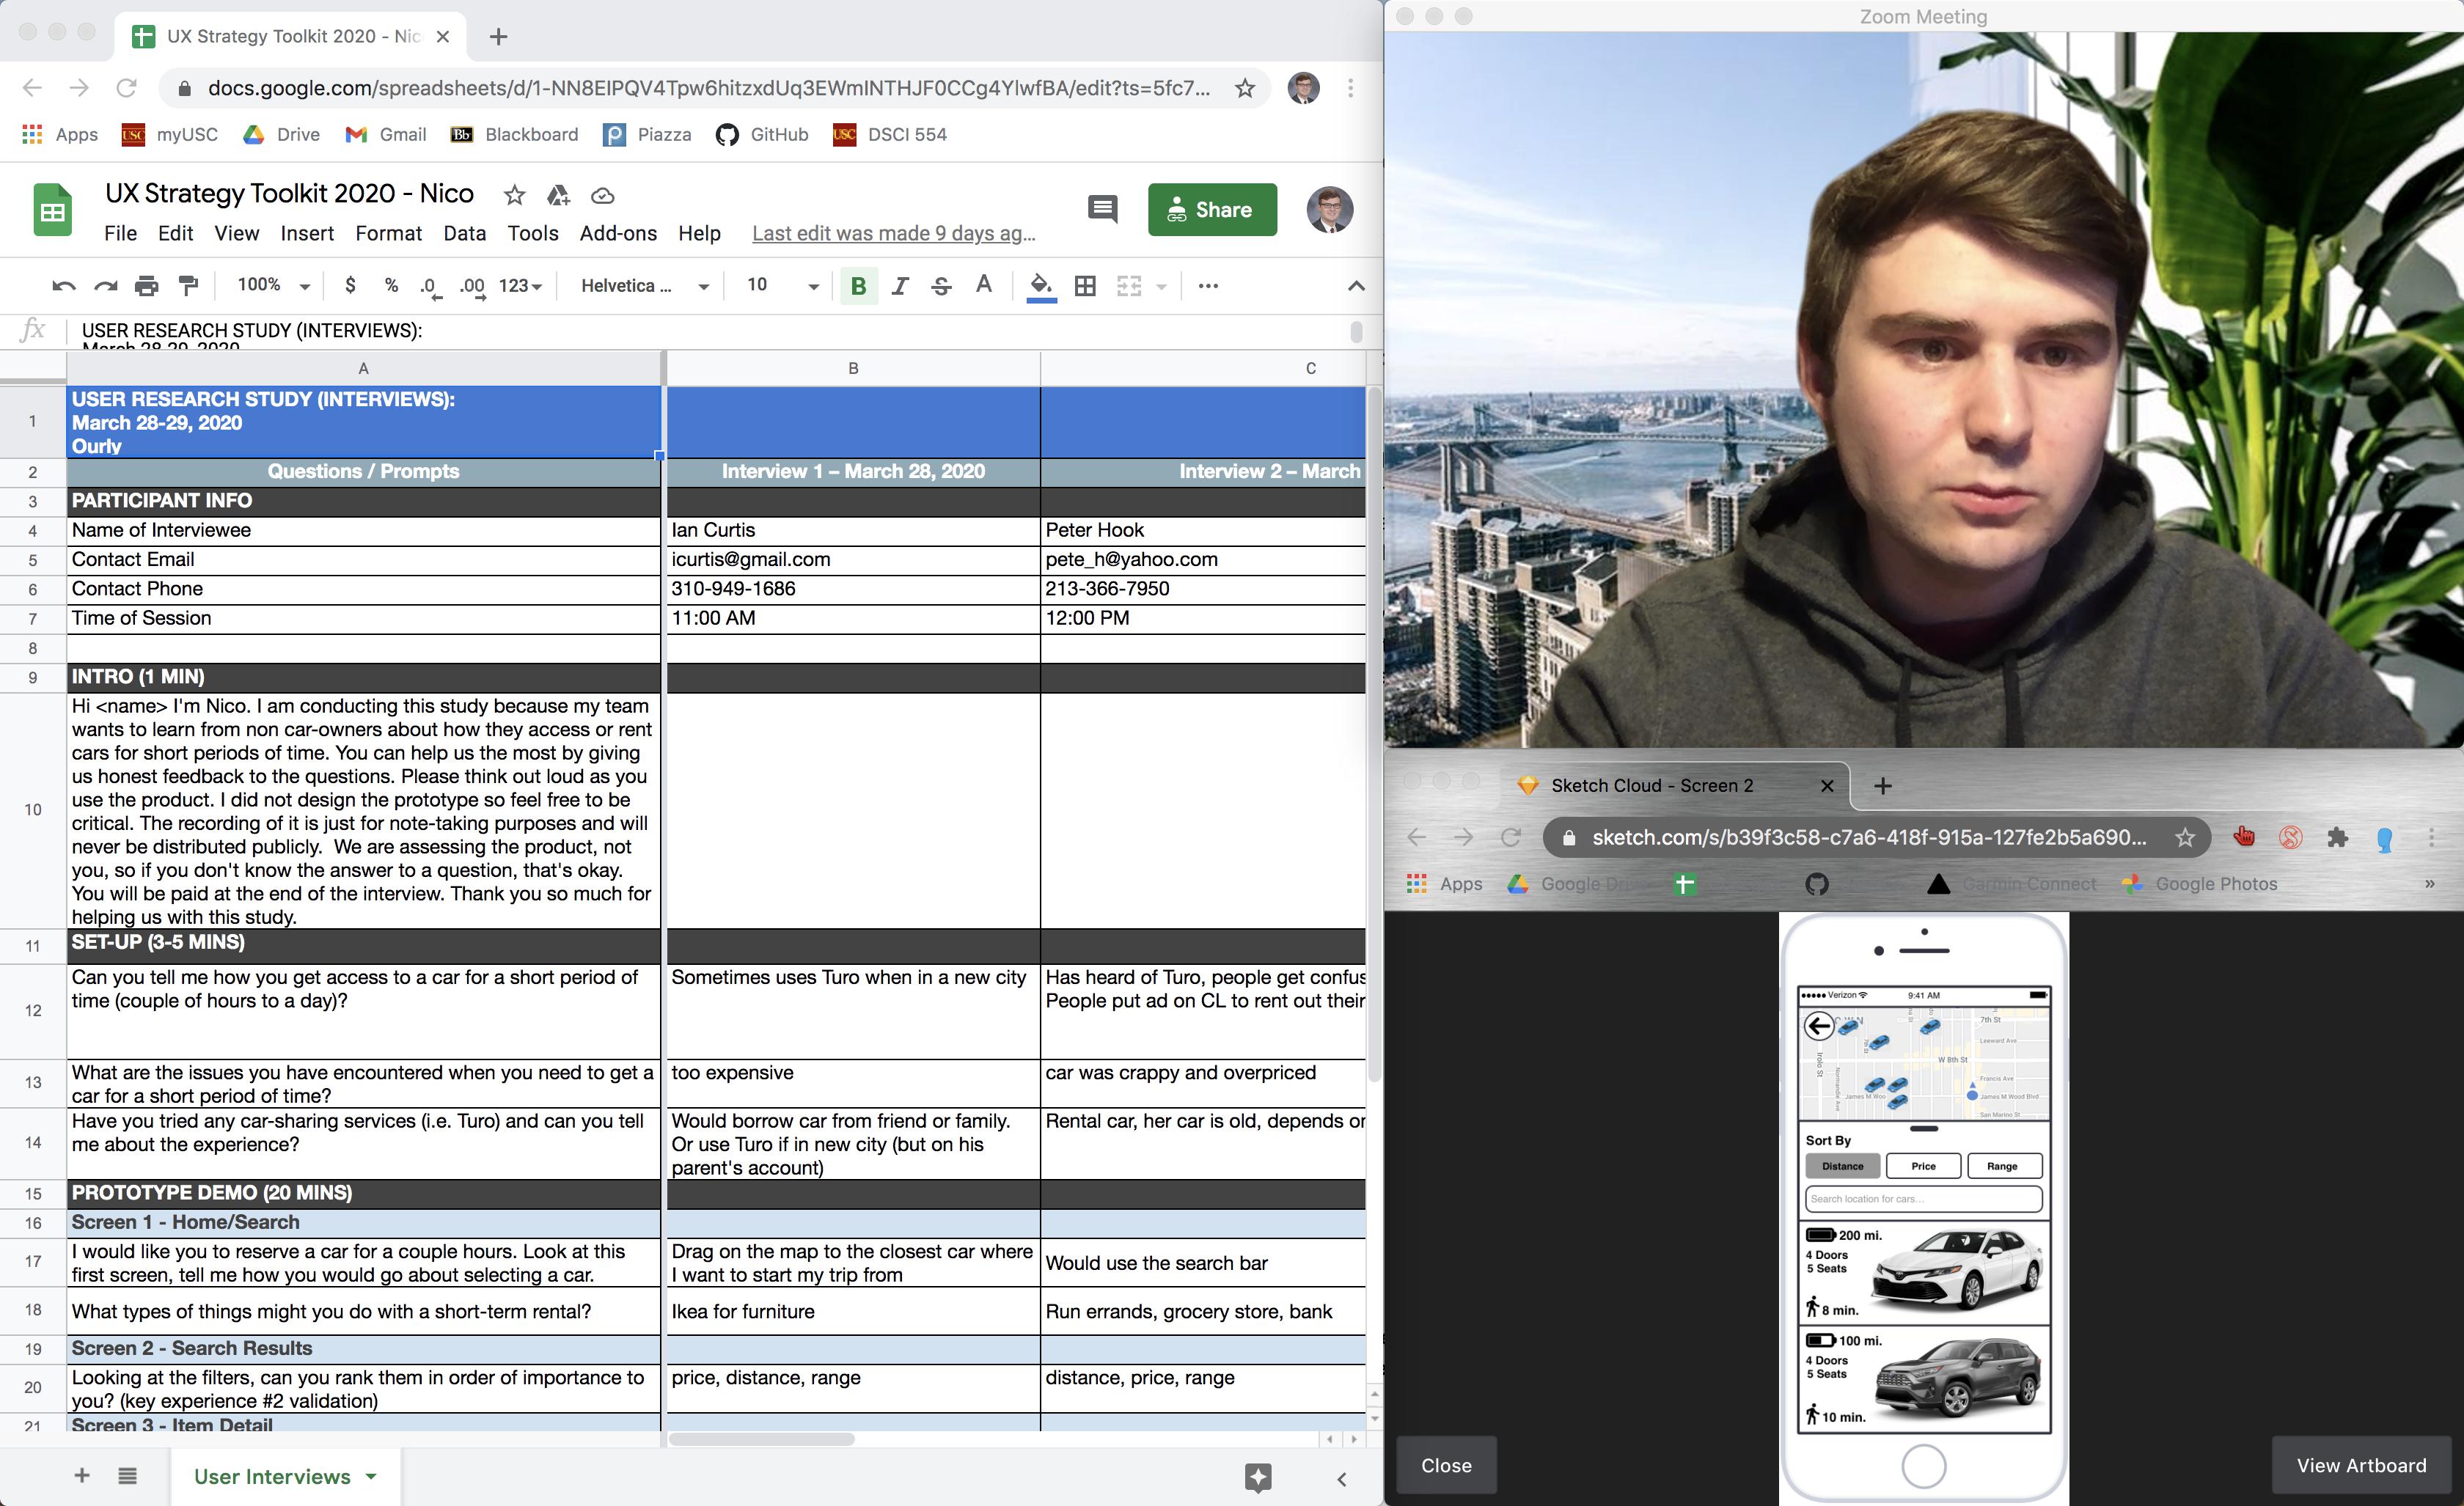 onlline user research setup